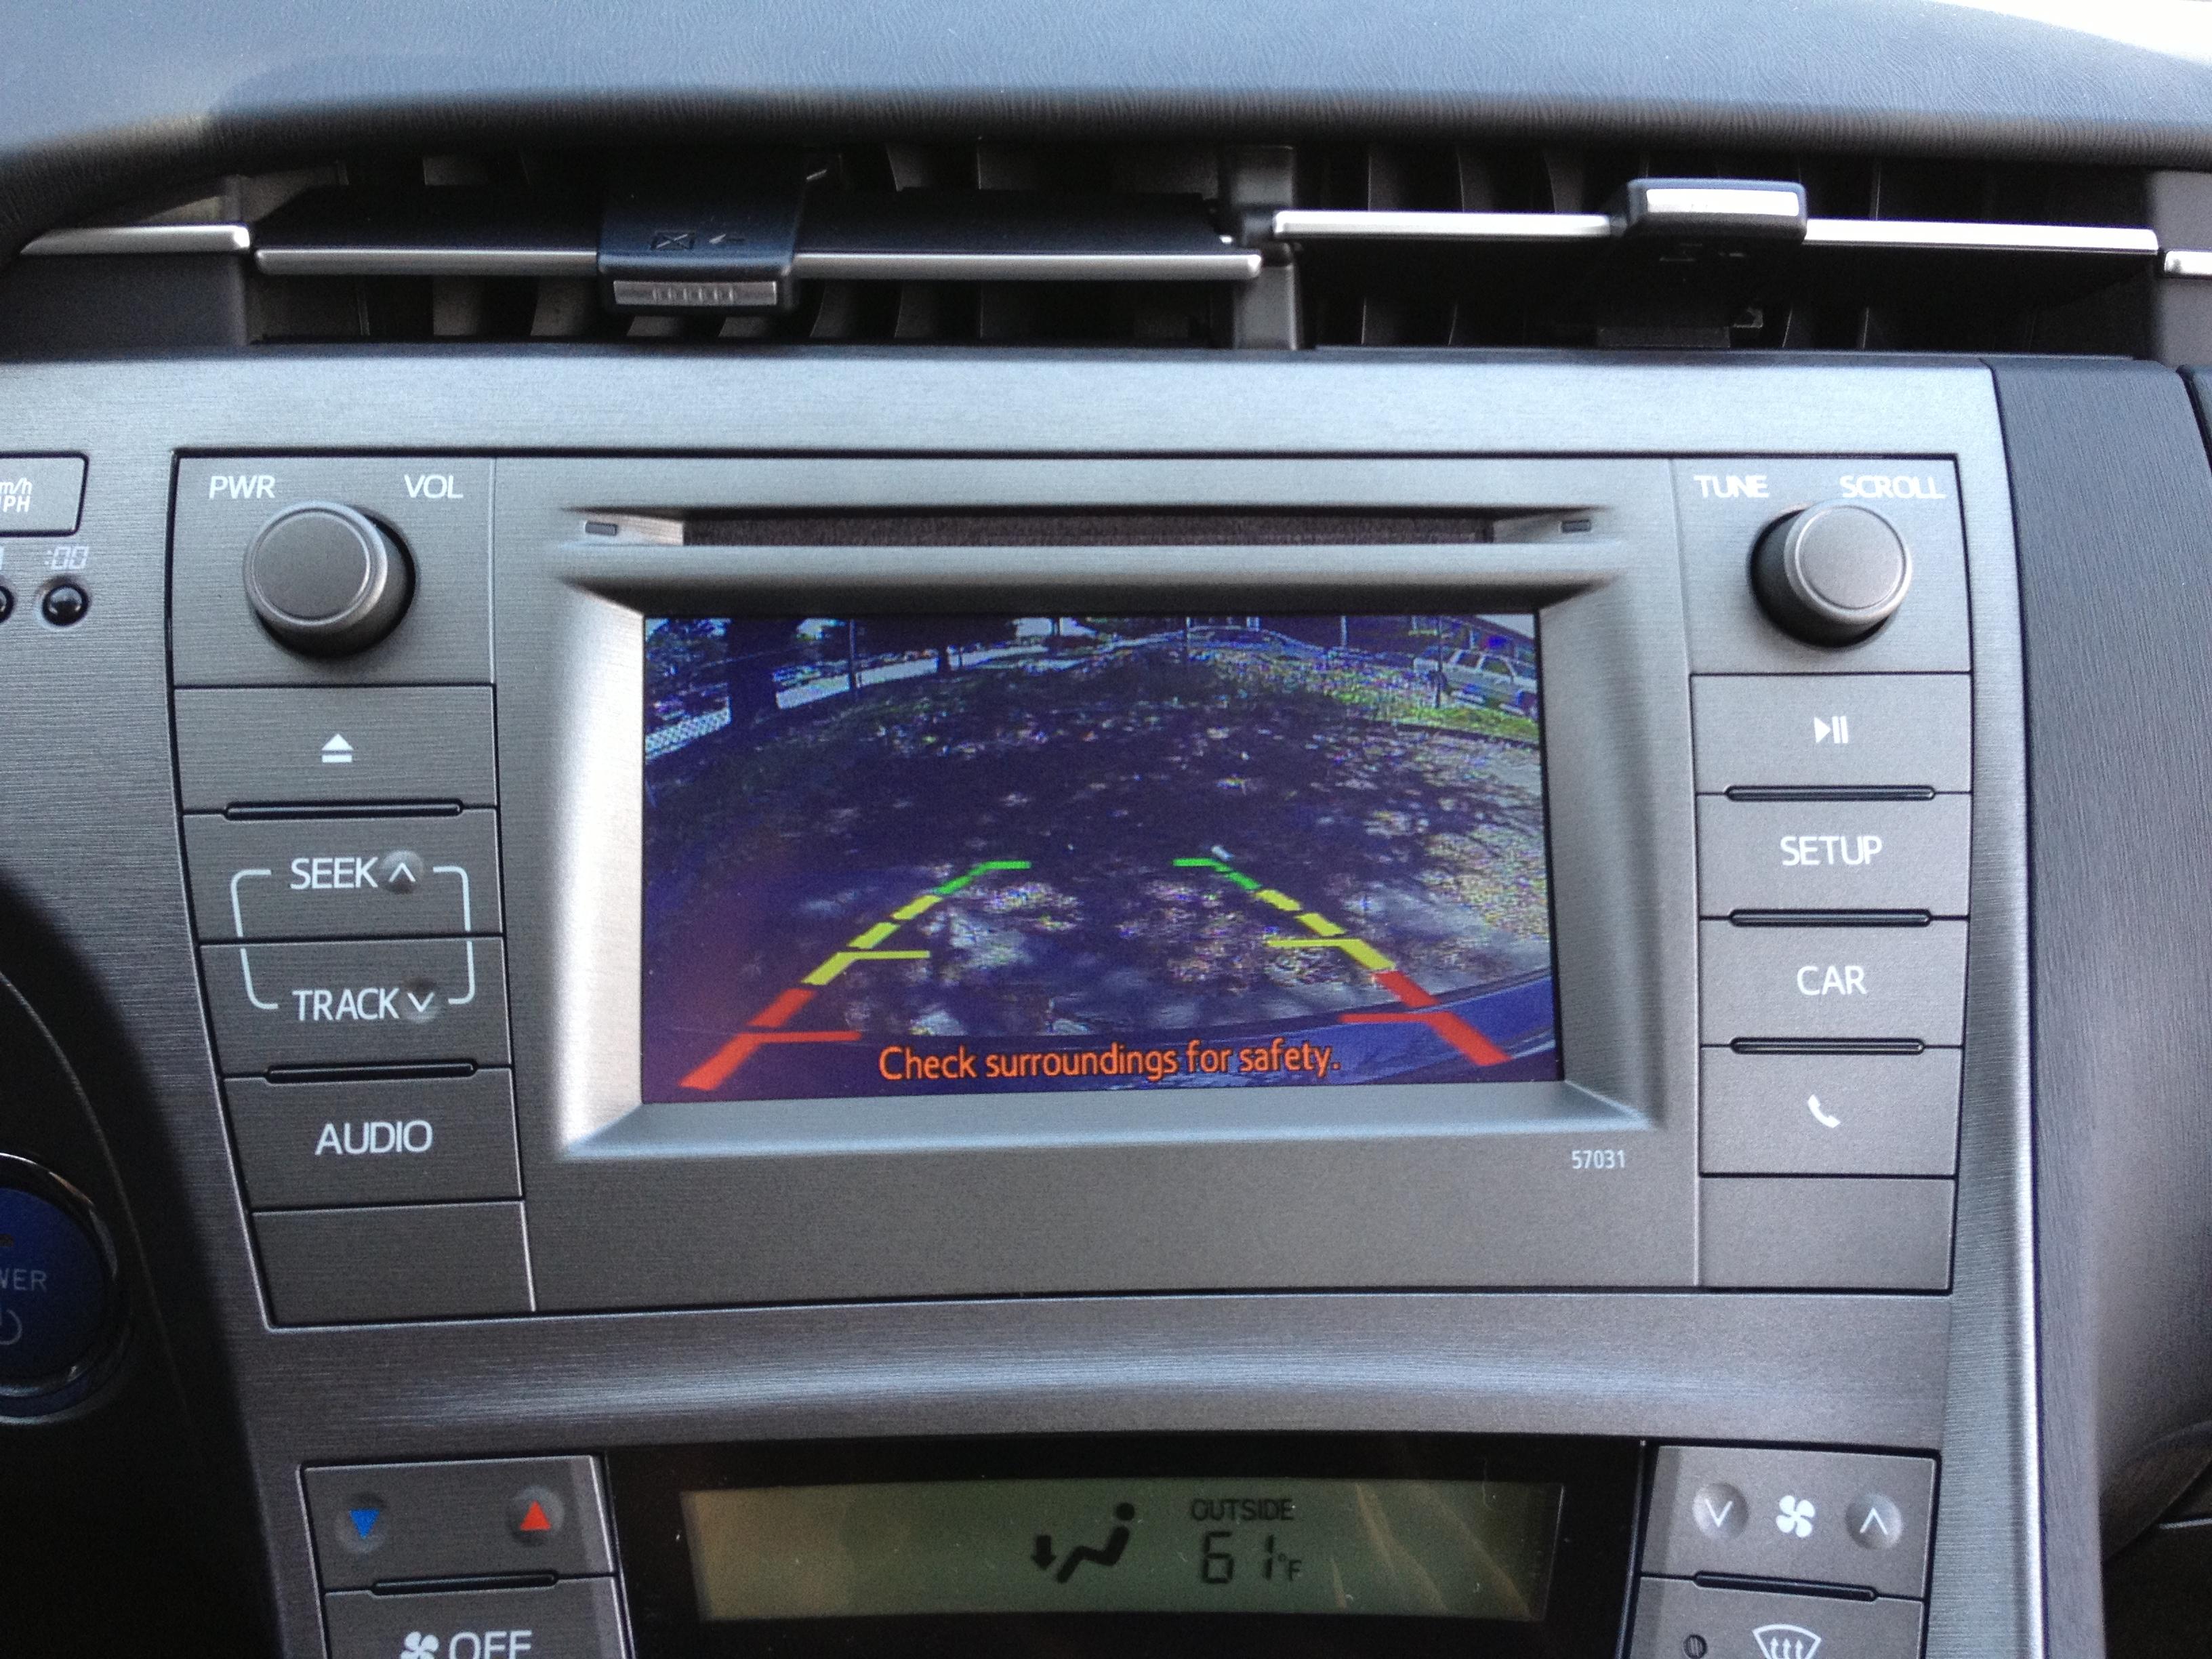 Vz 5521 Backup Camera Wiring Diagram Besides Toyota Camry Radio Wiring Diagram